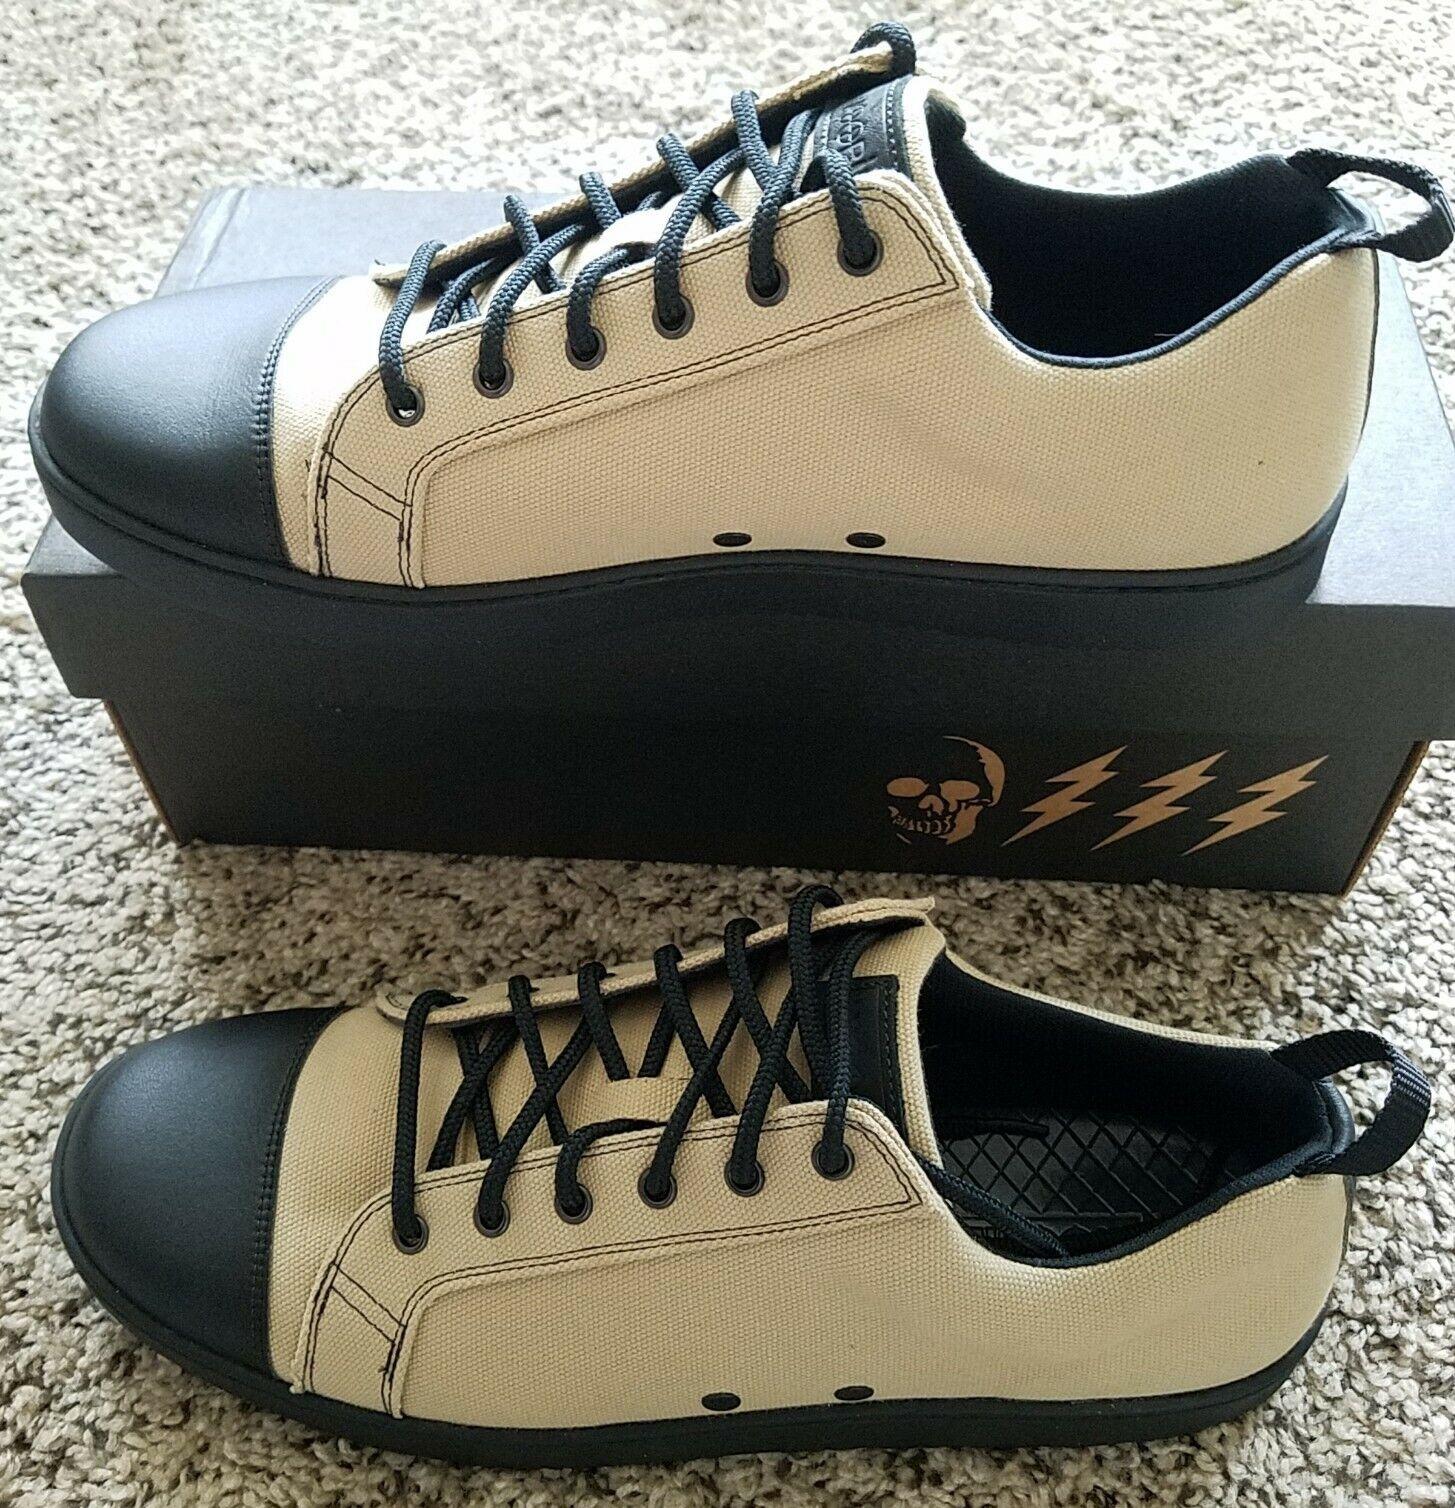 Woobies Sahara MOD-1 Lace Up Athletic Shoes Unisex 11.5 Men / 13Women brown nib